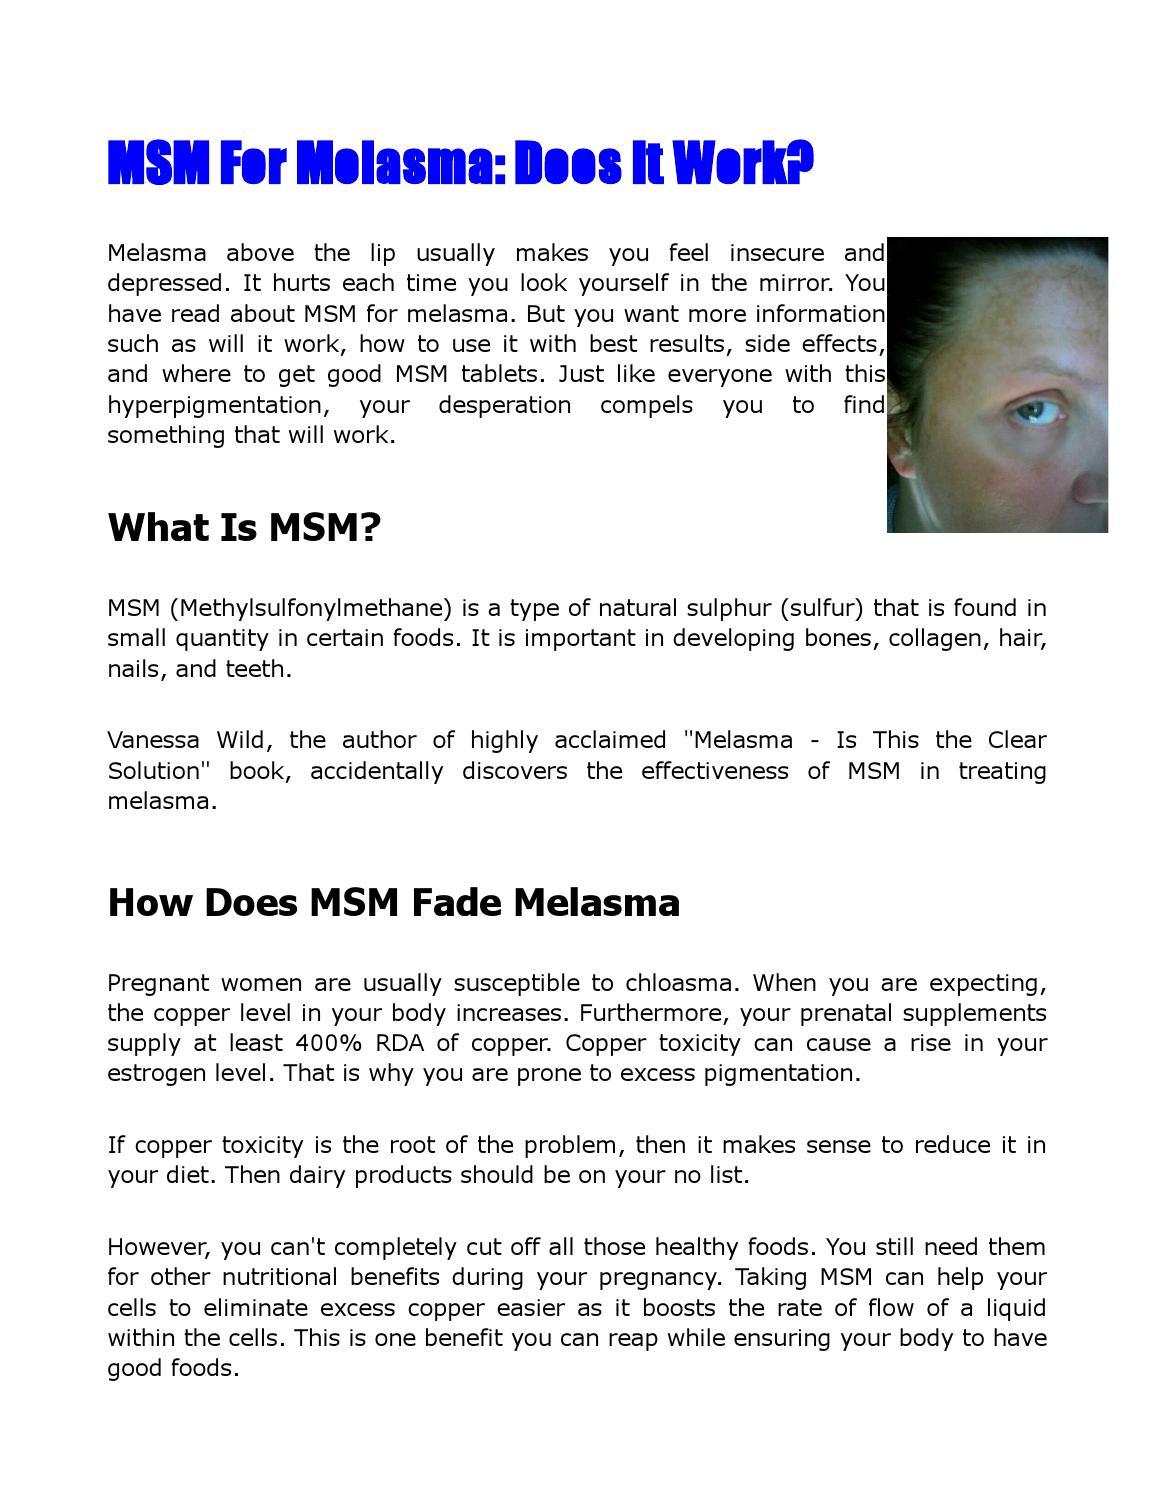 Msm for melasma